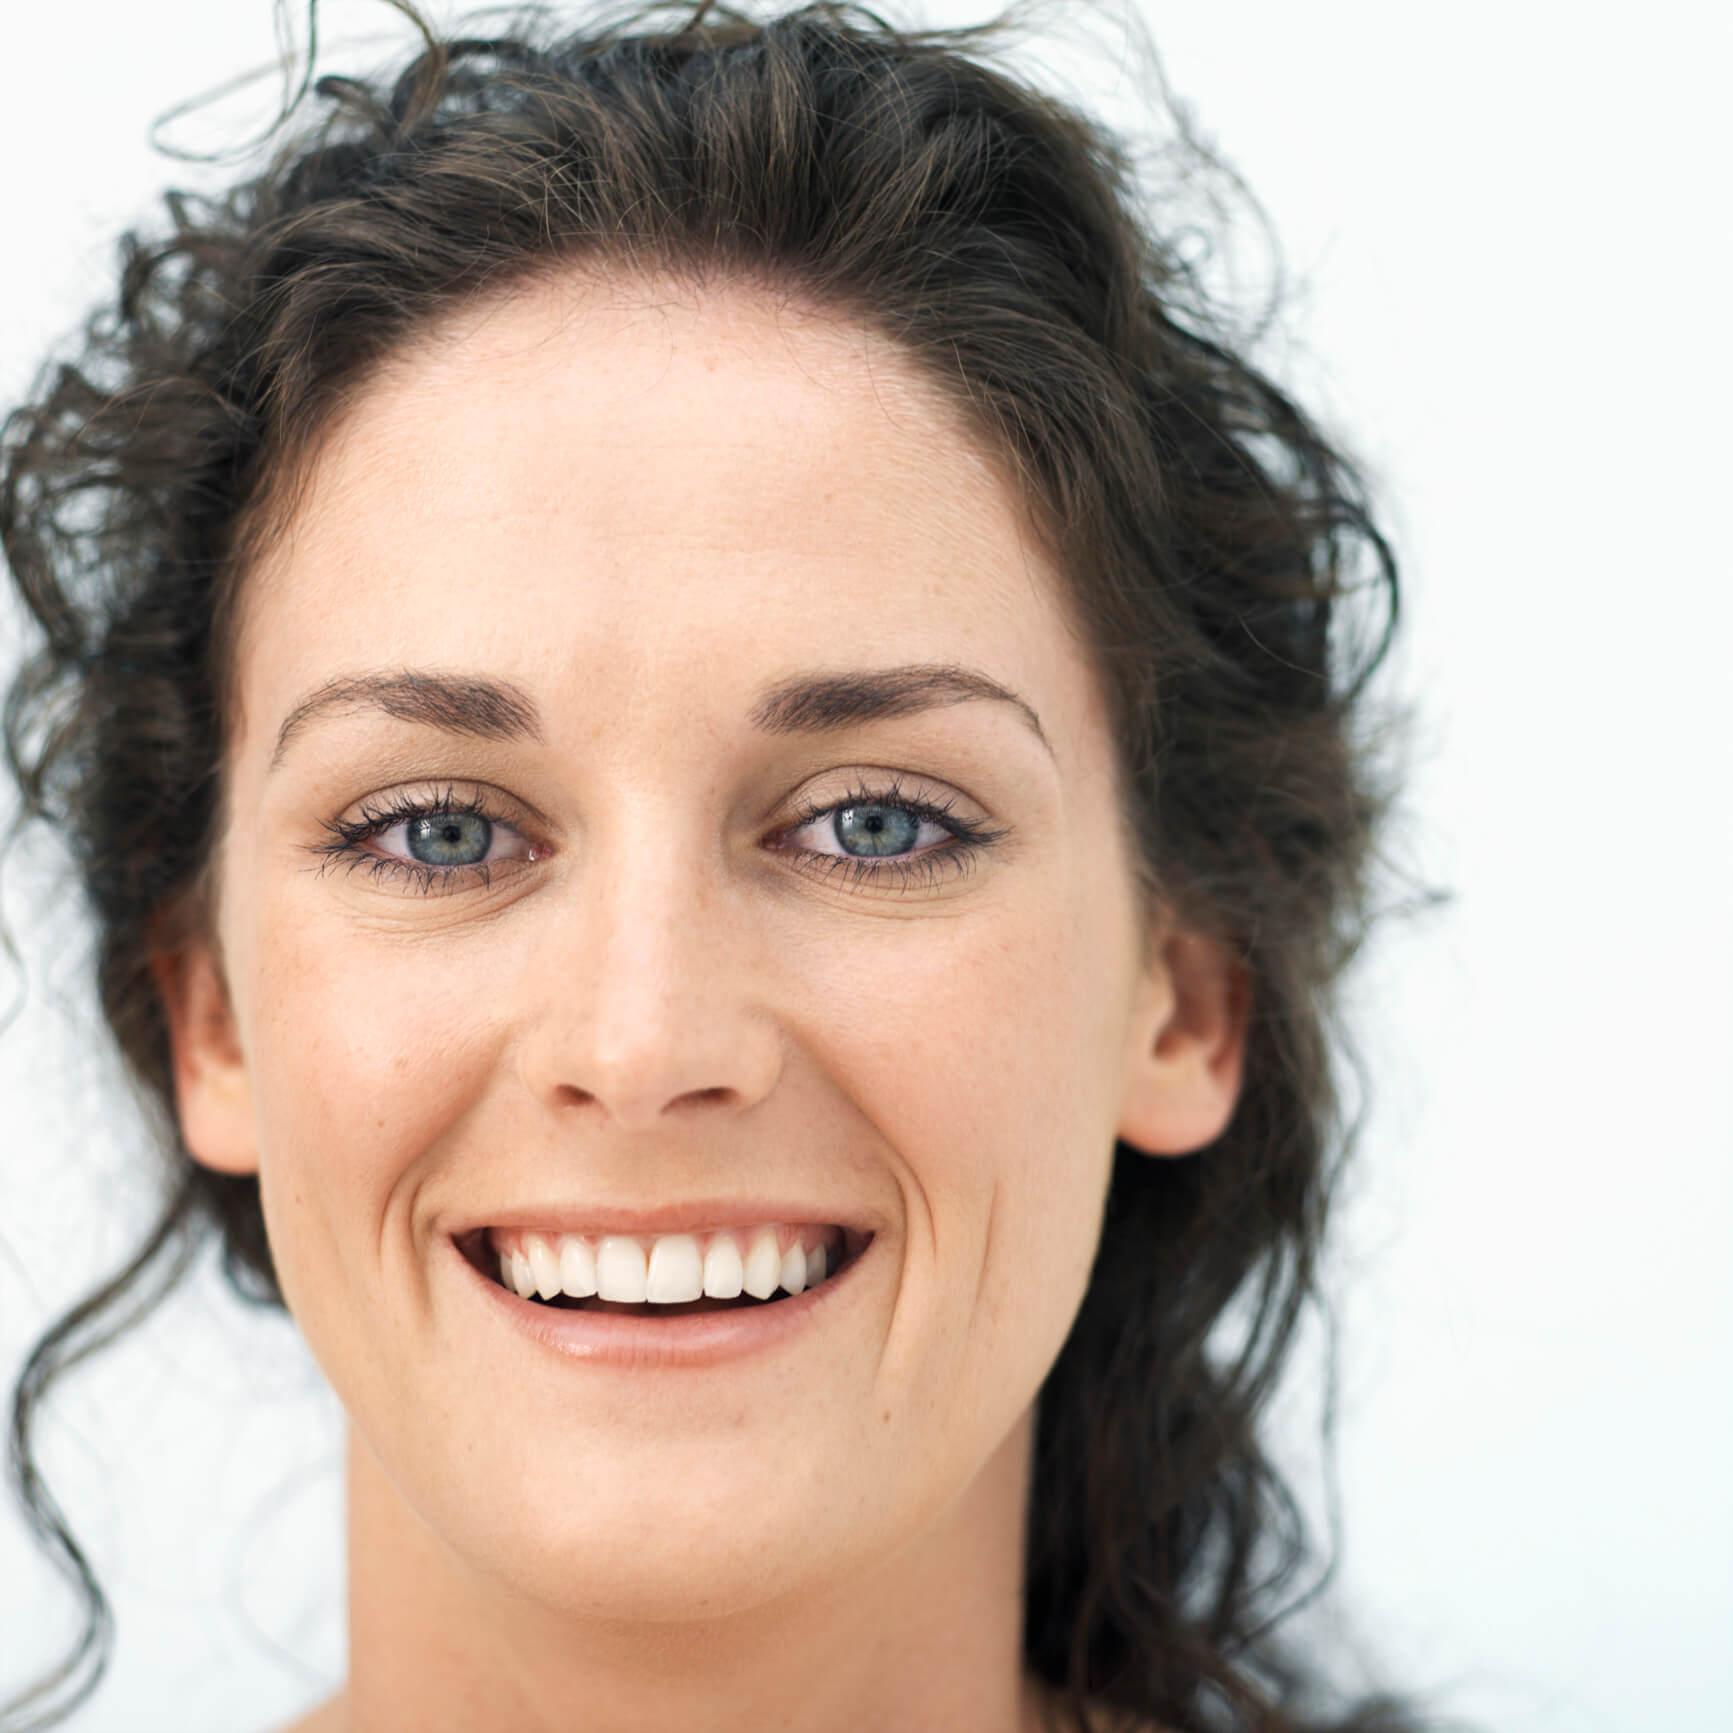 teeth whitening cost